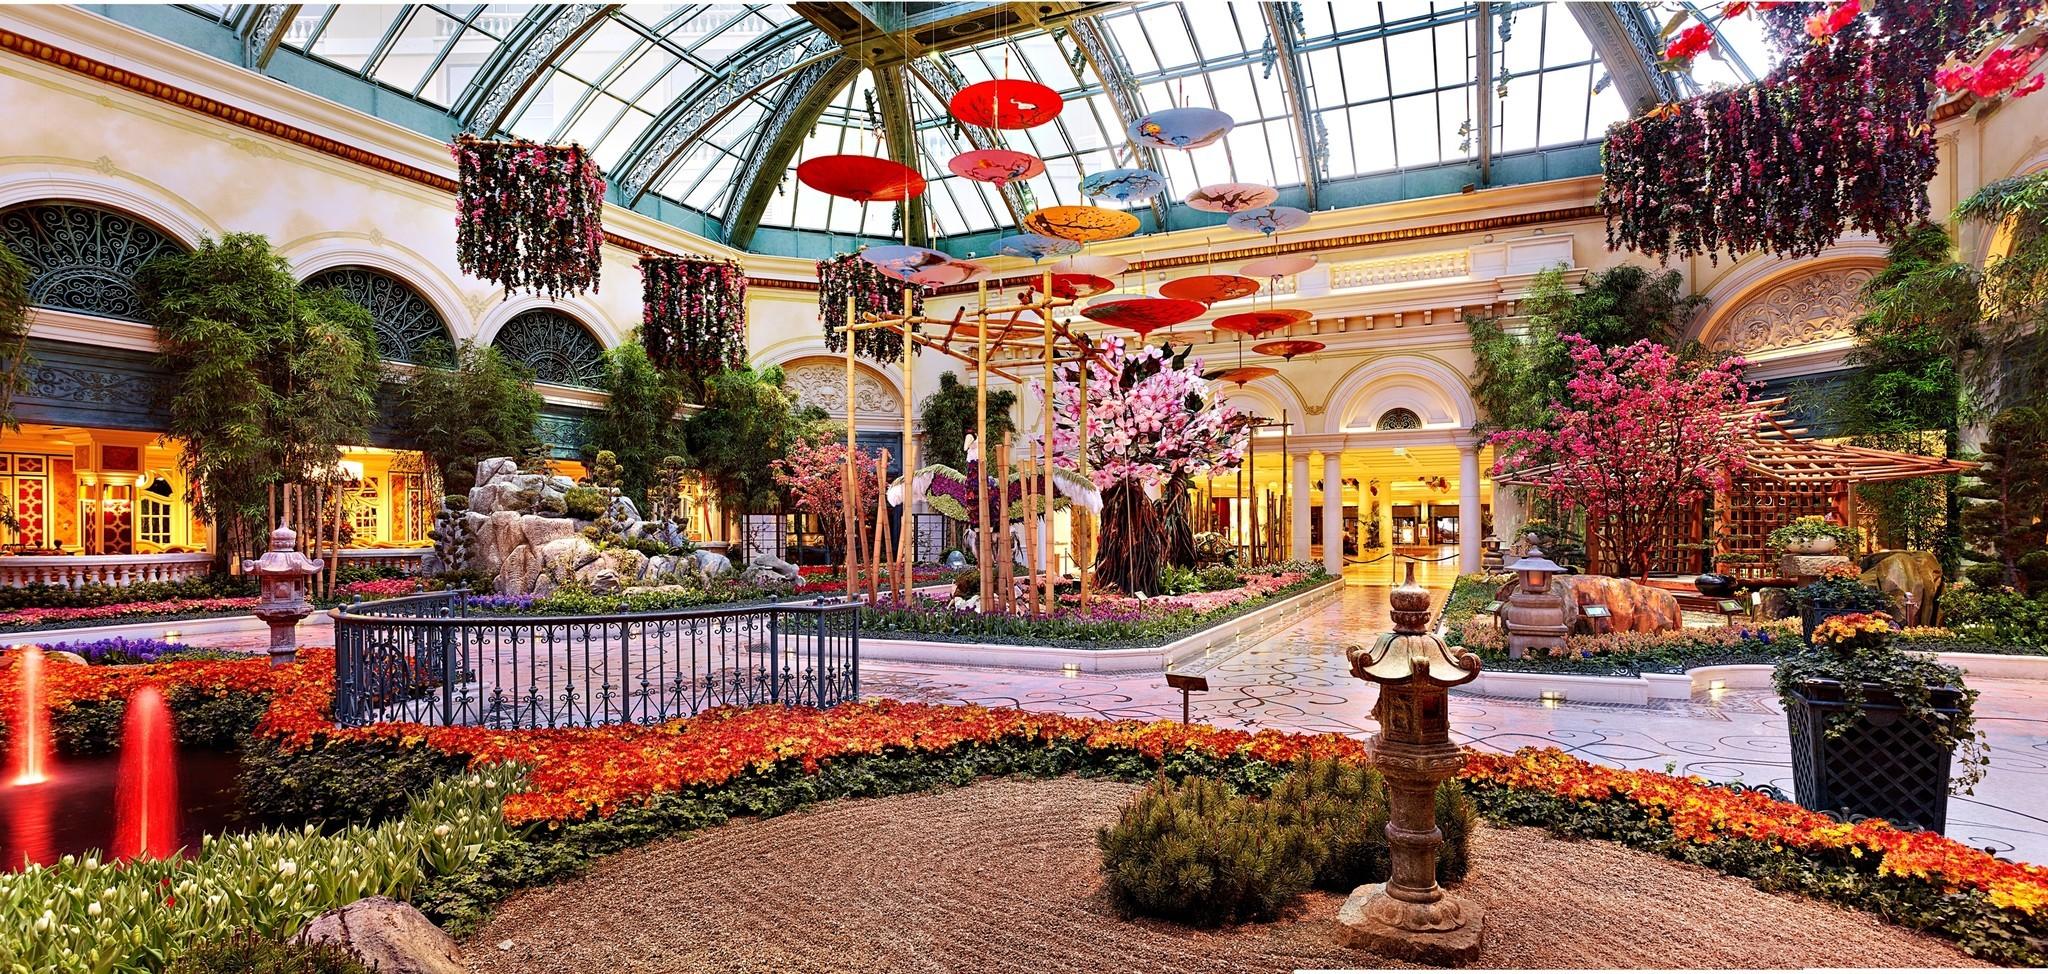 Bellagio Conservatory Spring Display La Times